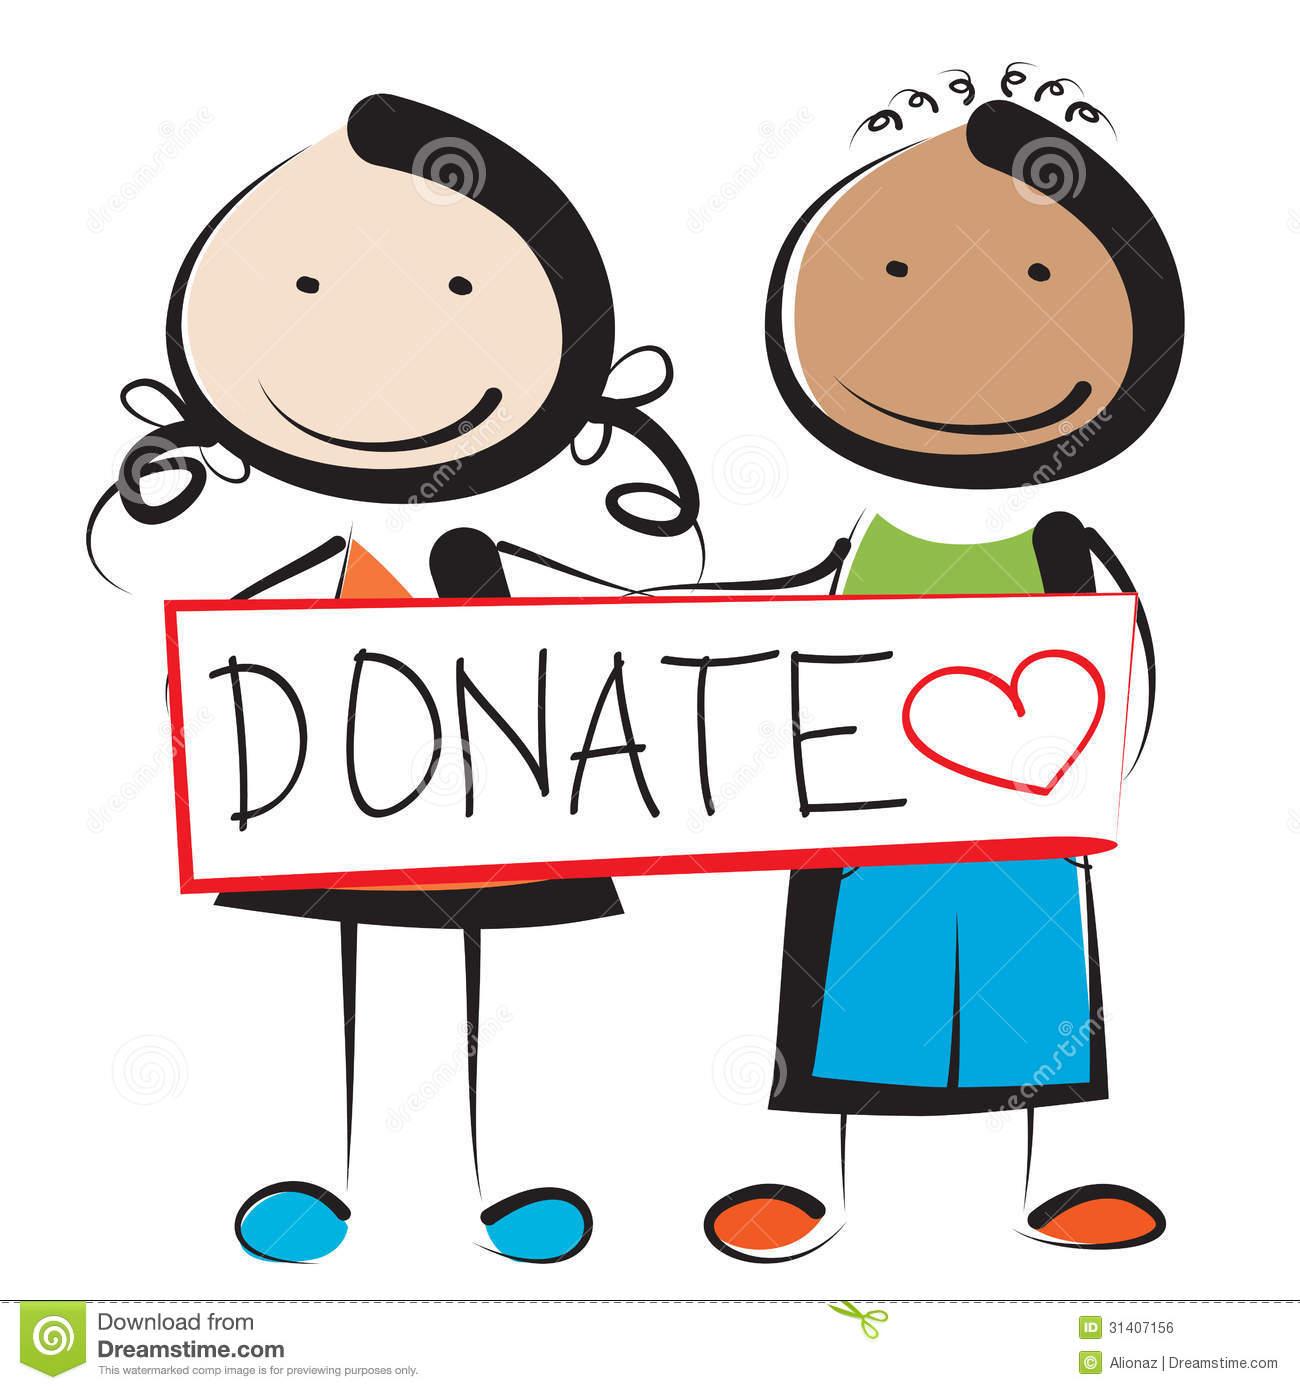 Donate clipart image transparent download Donate Clipart Group with 18+ items image transparent download